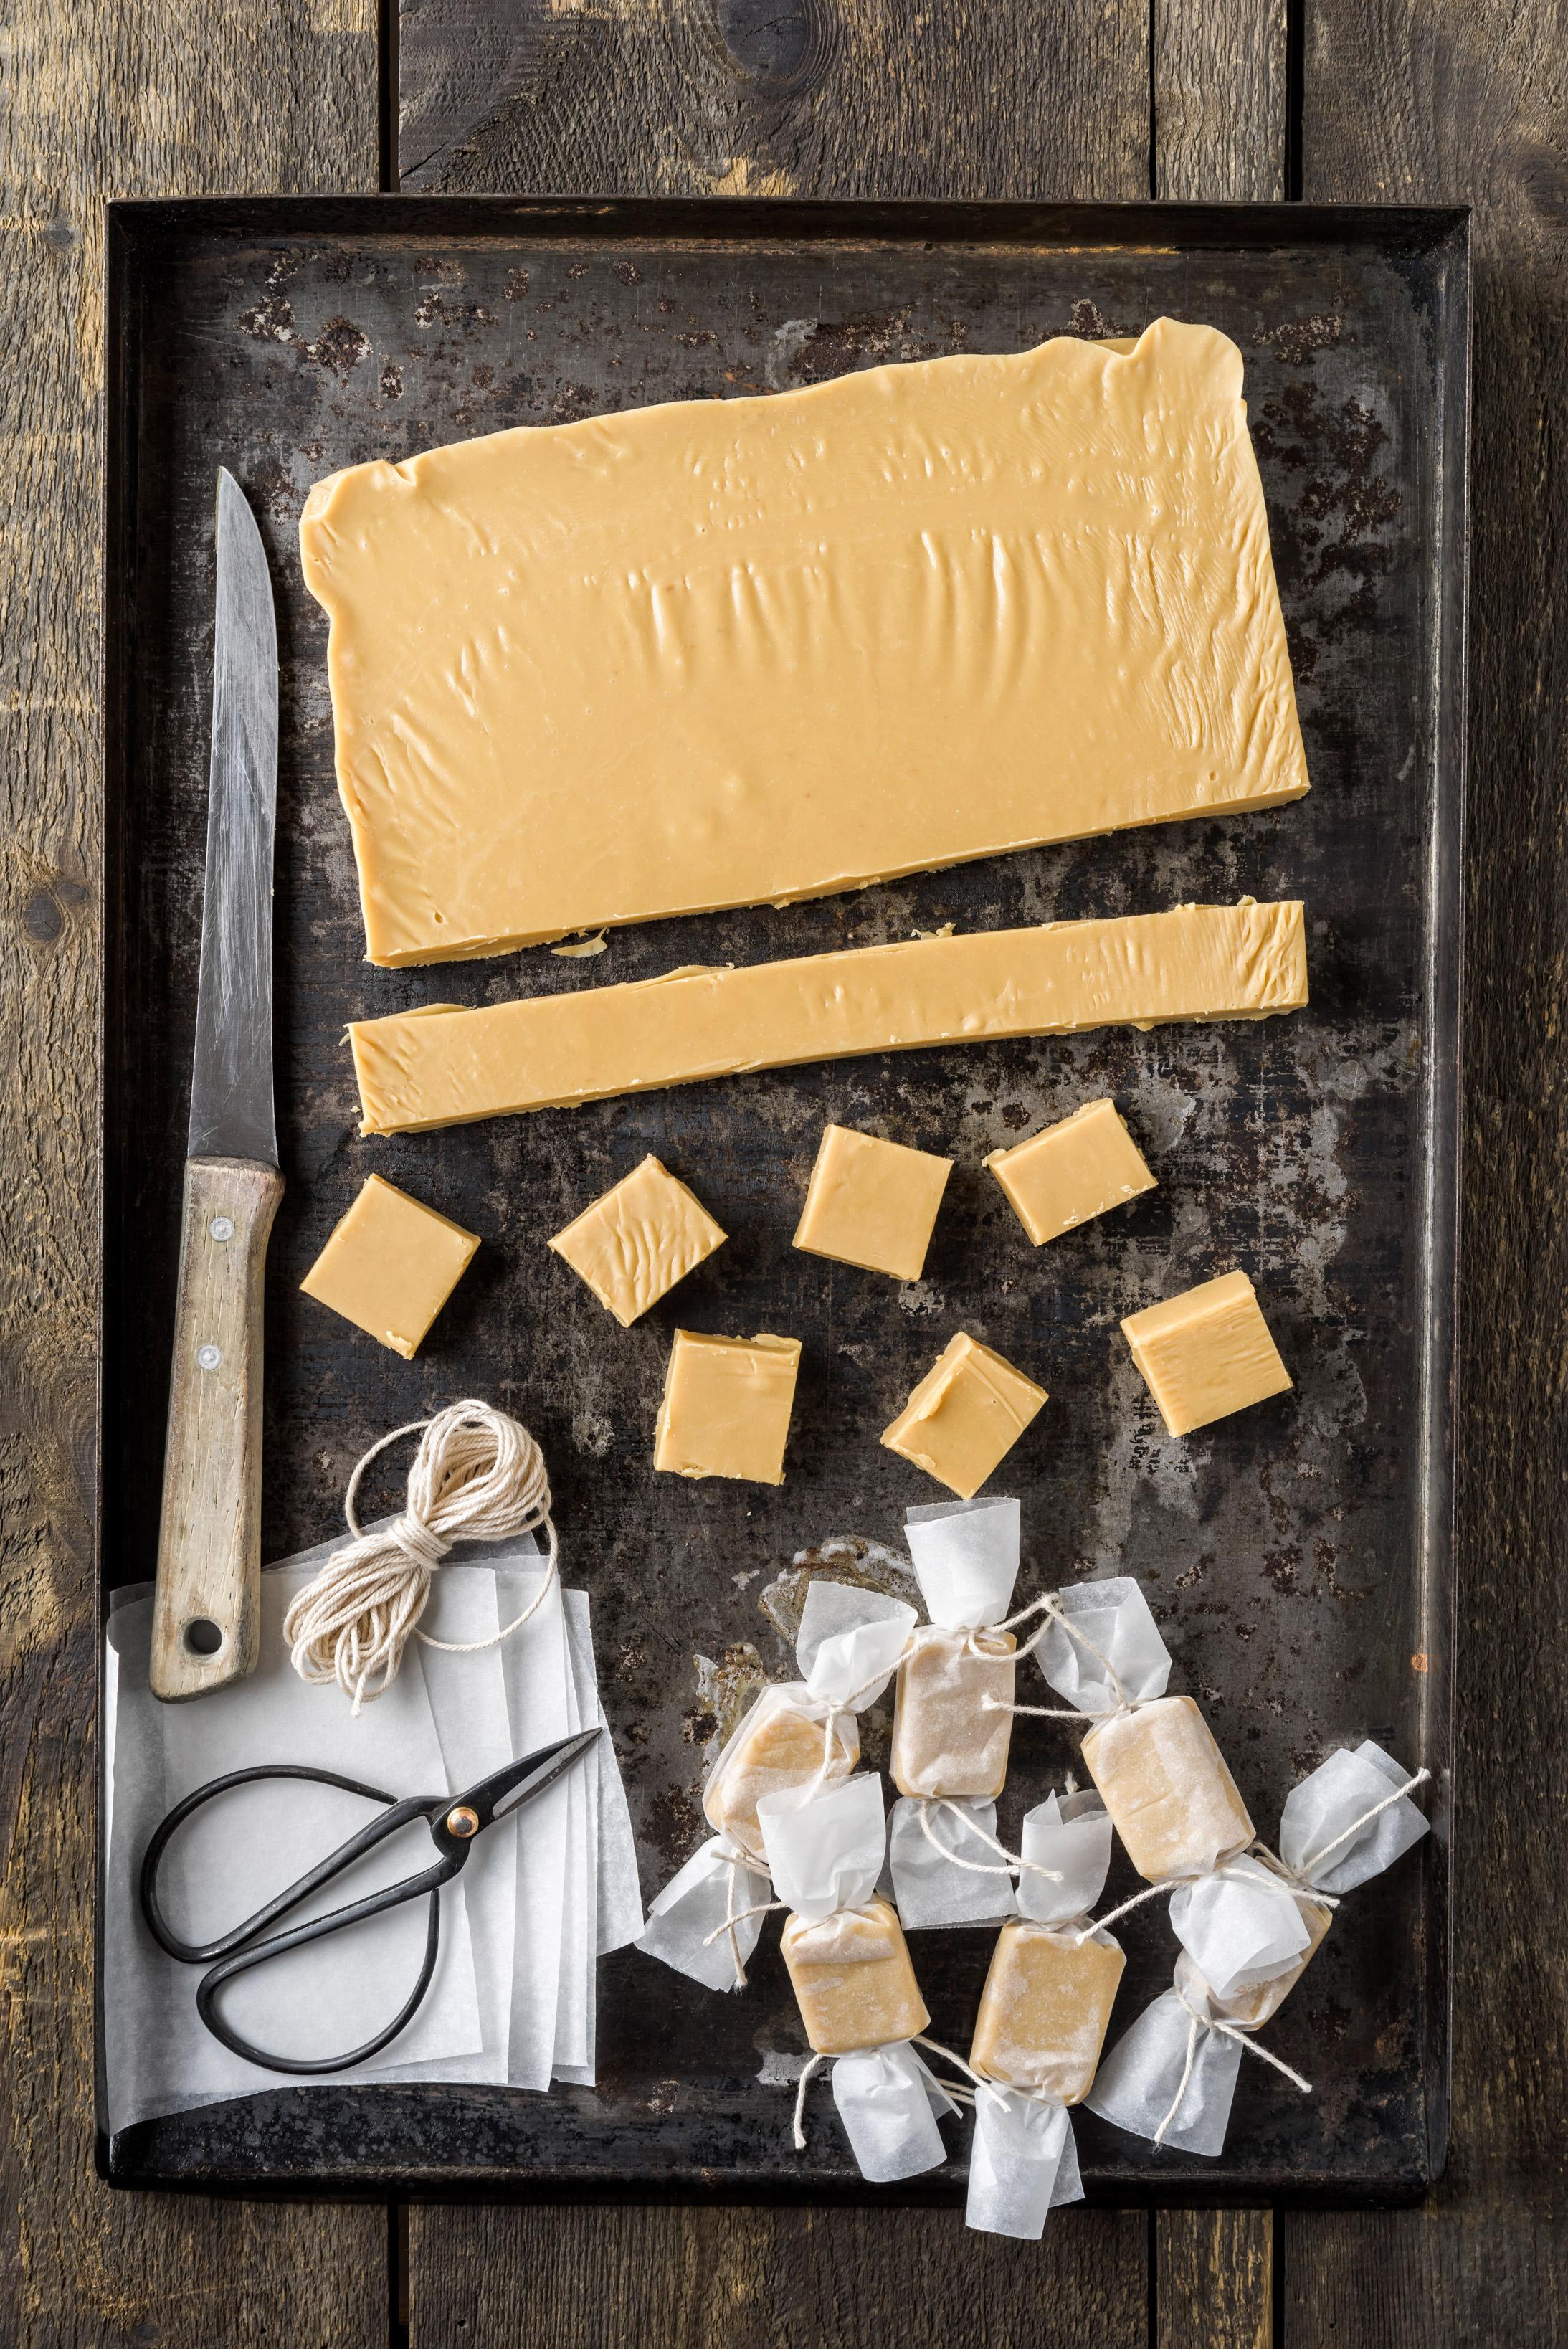 Karamell (Fudge) - foodphotolove.de